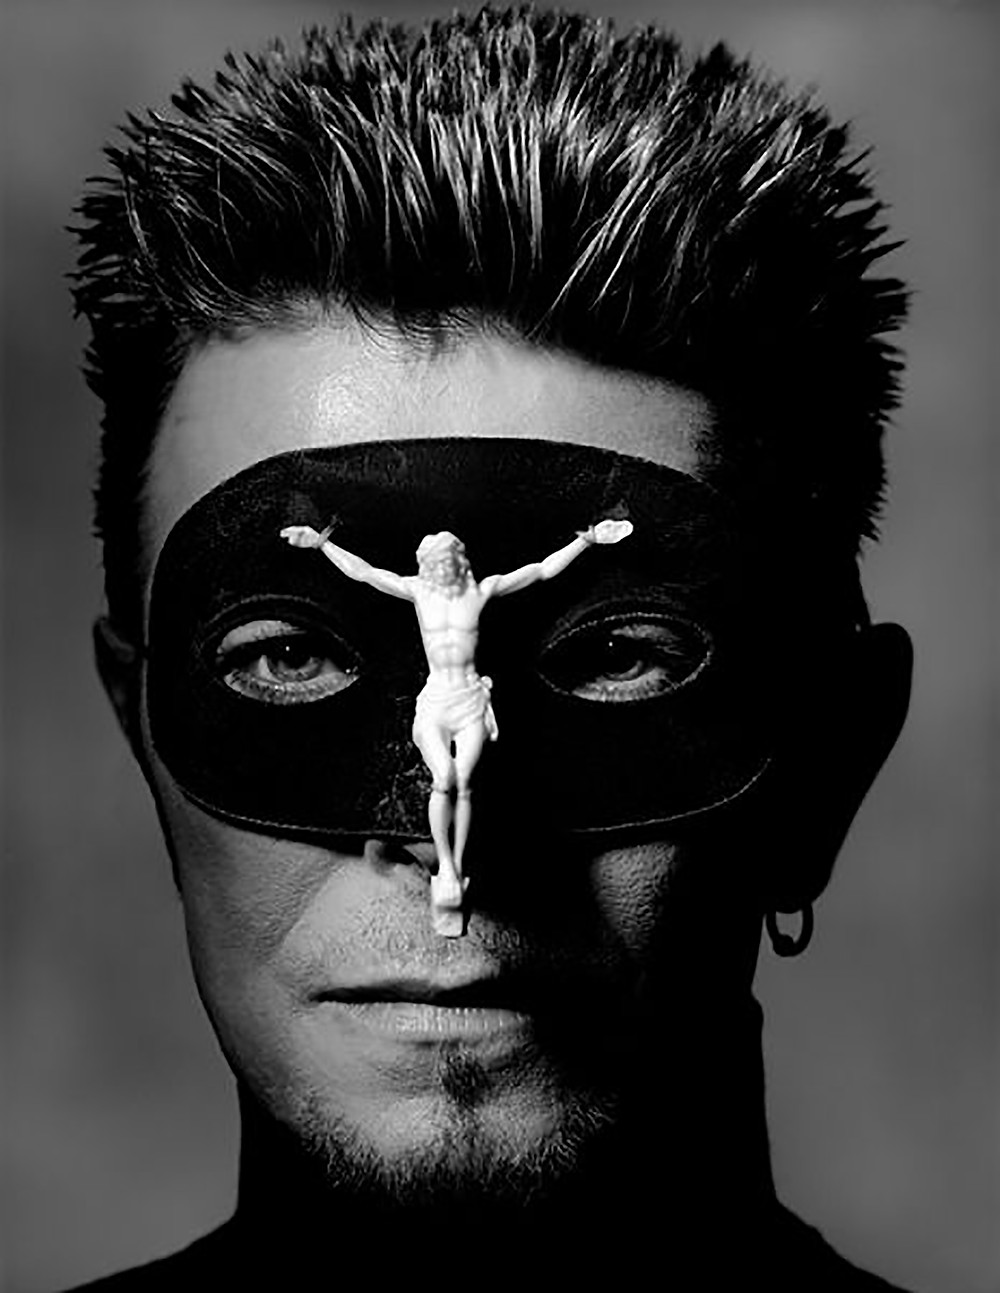 David Bowie maschera con crocifisso